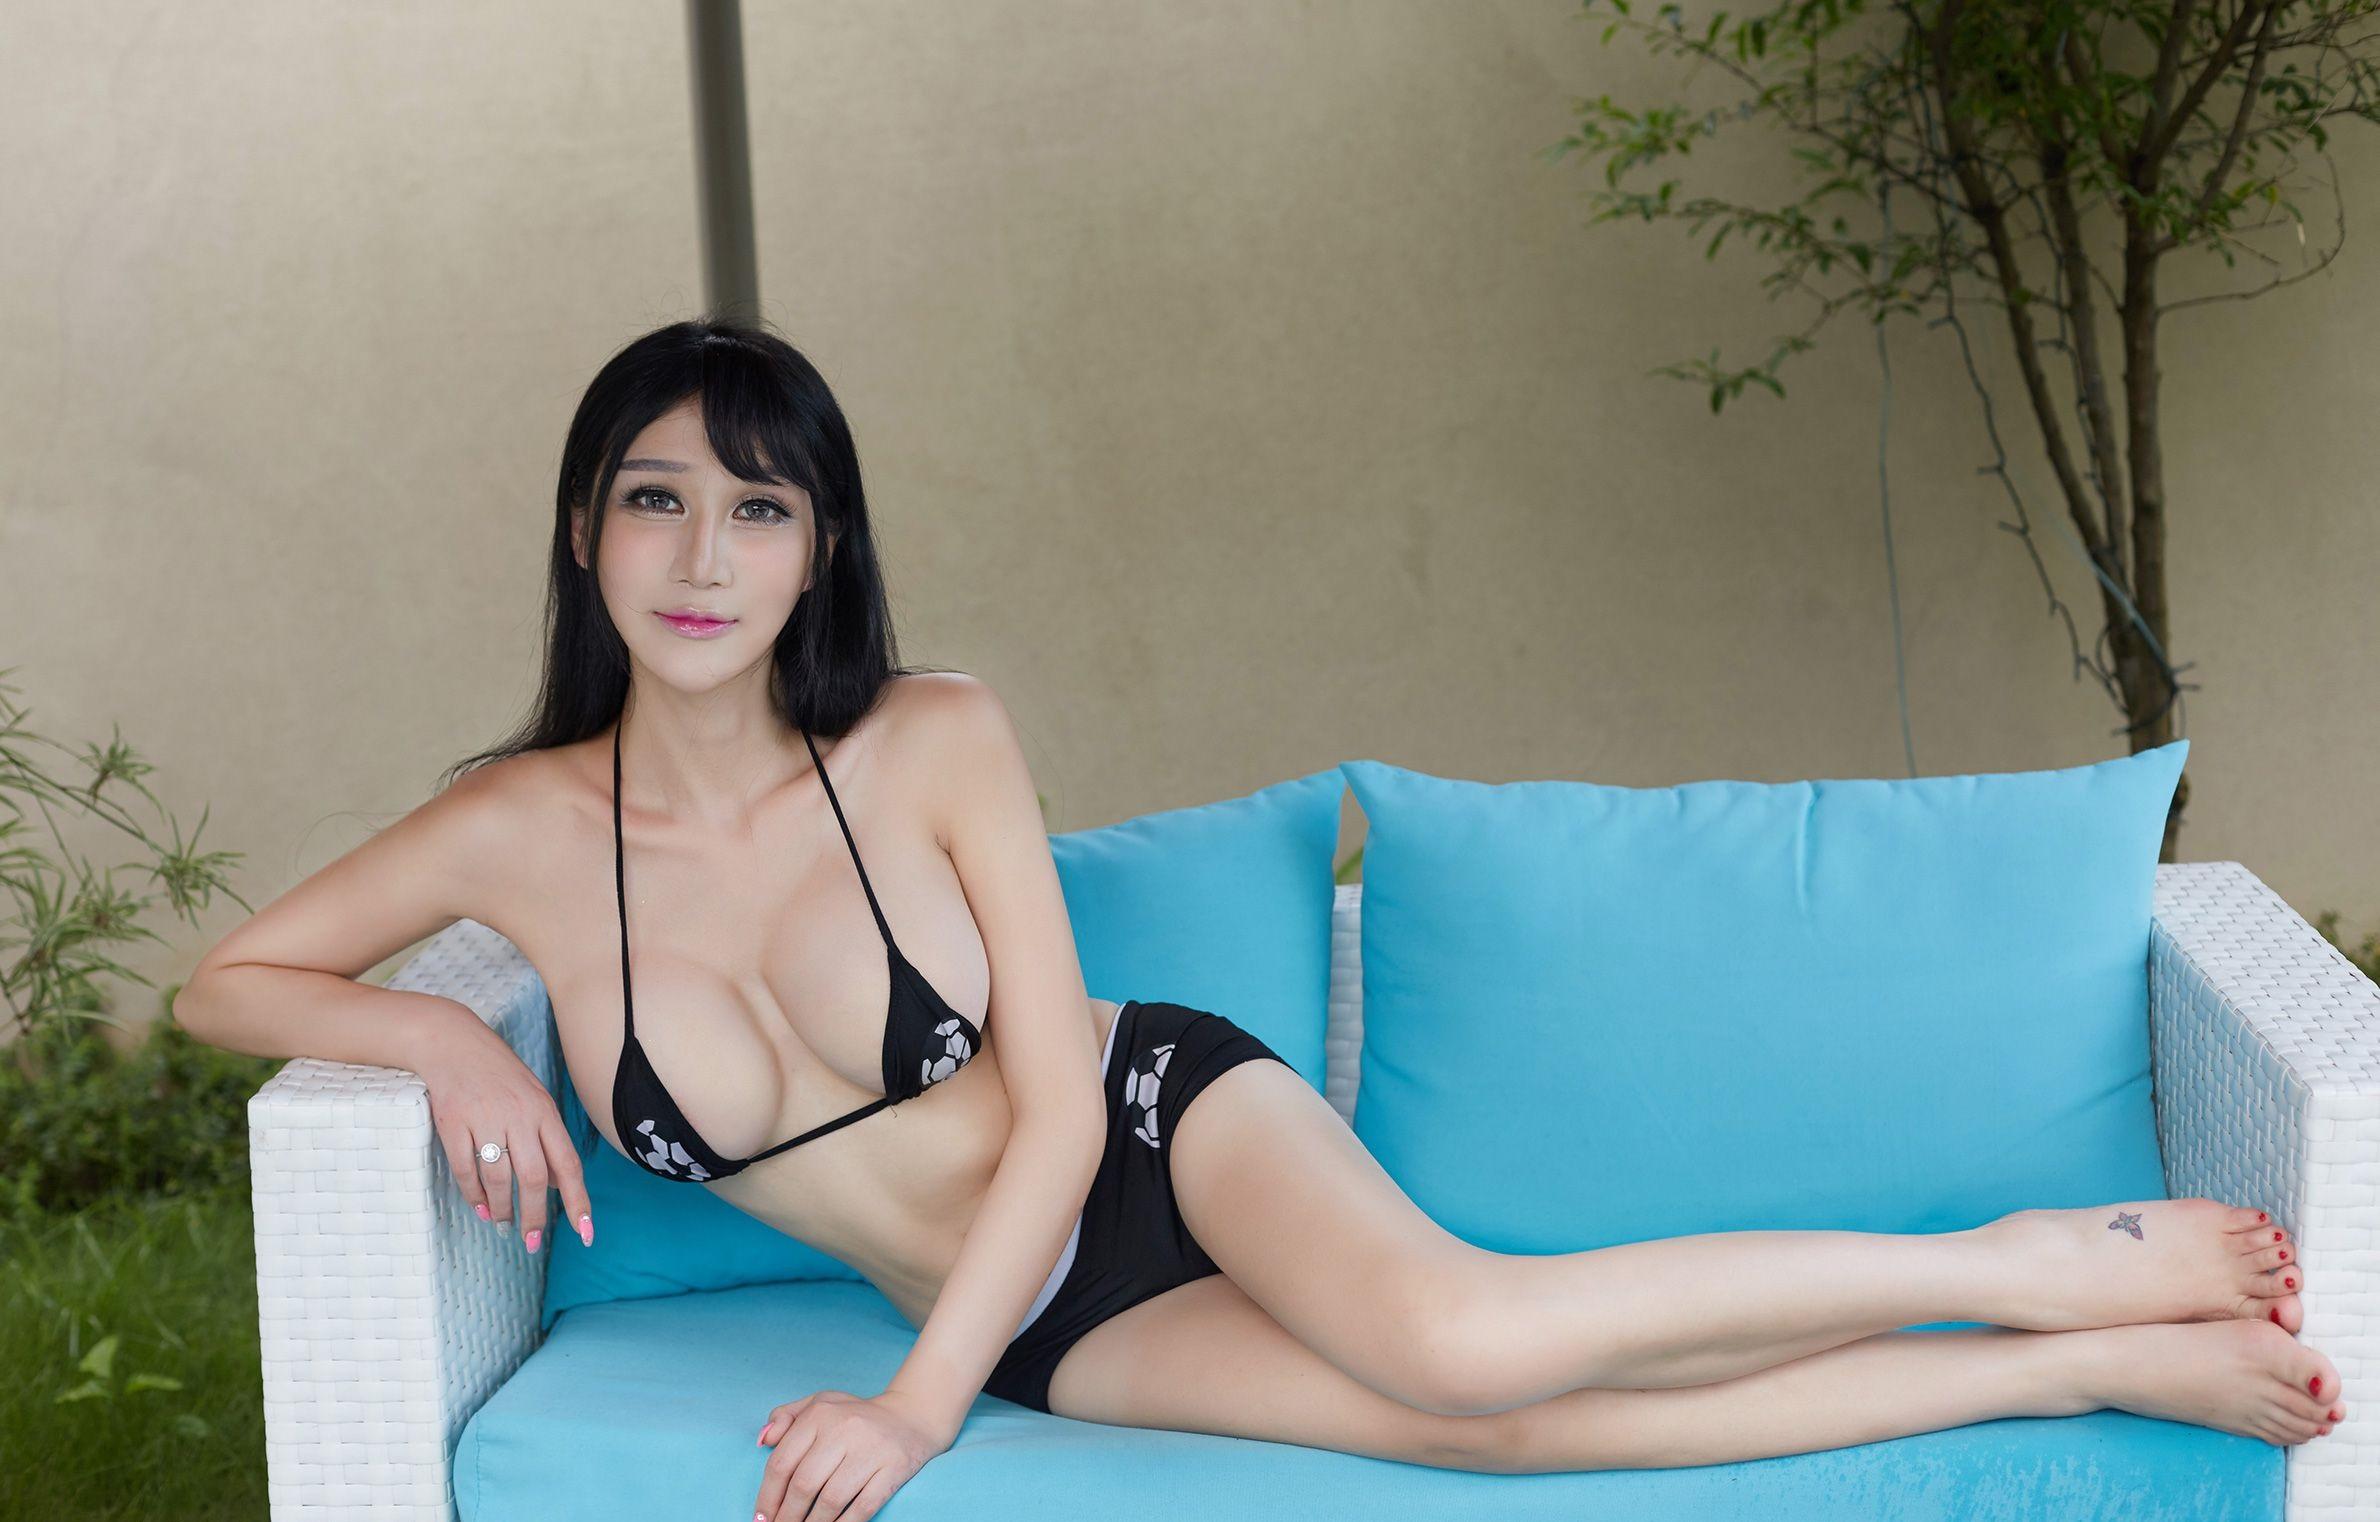 Wallpaper  Women, Asian, Couch, Bikini Top, Portrait -8259